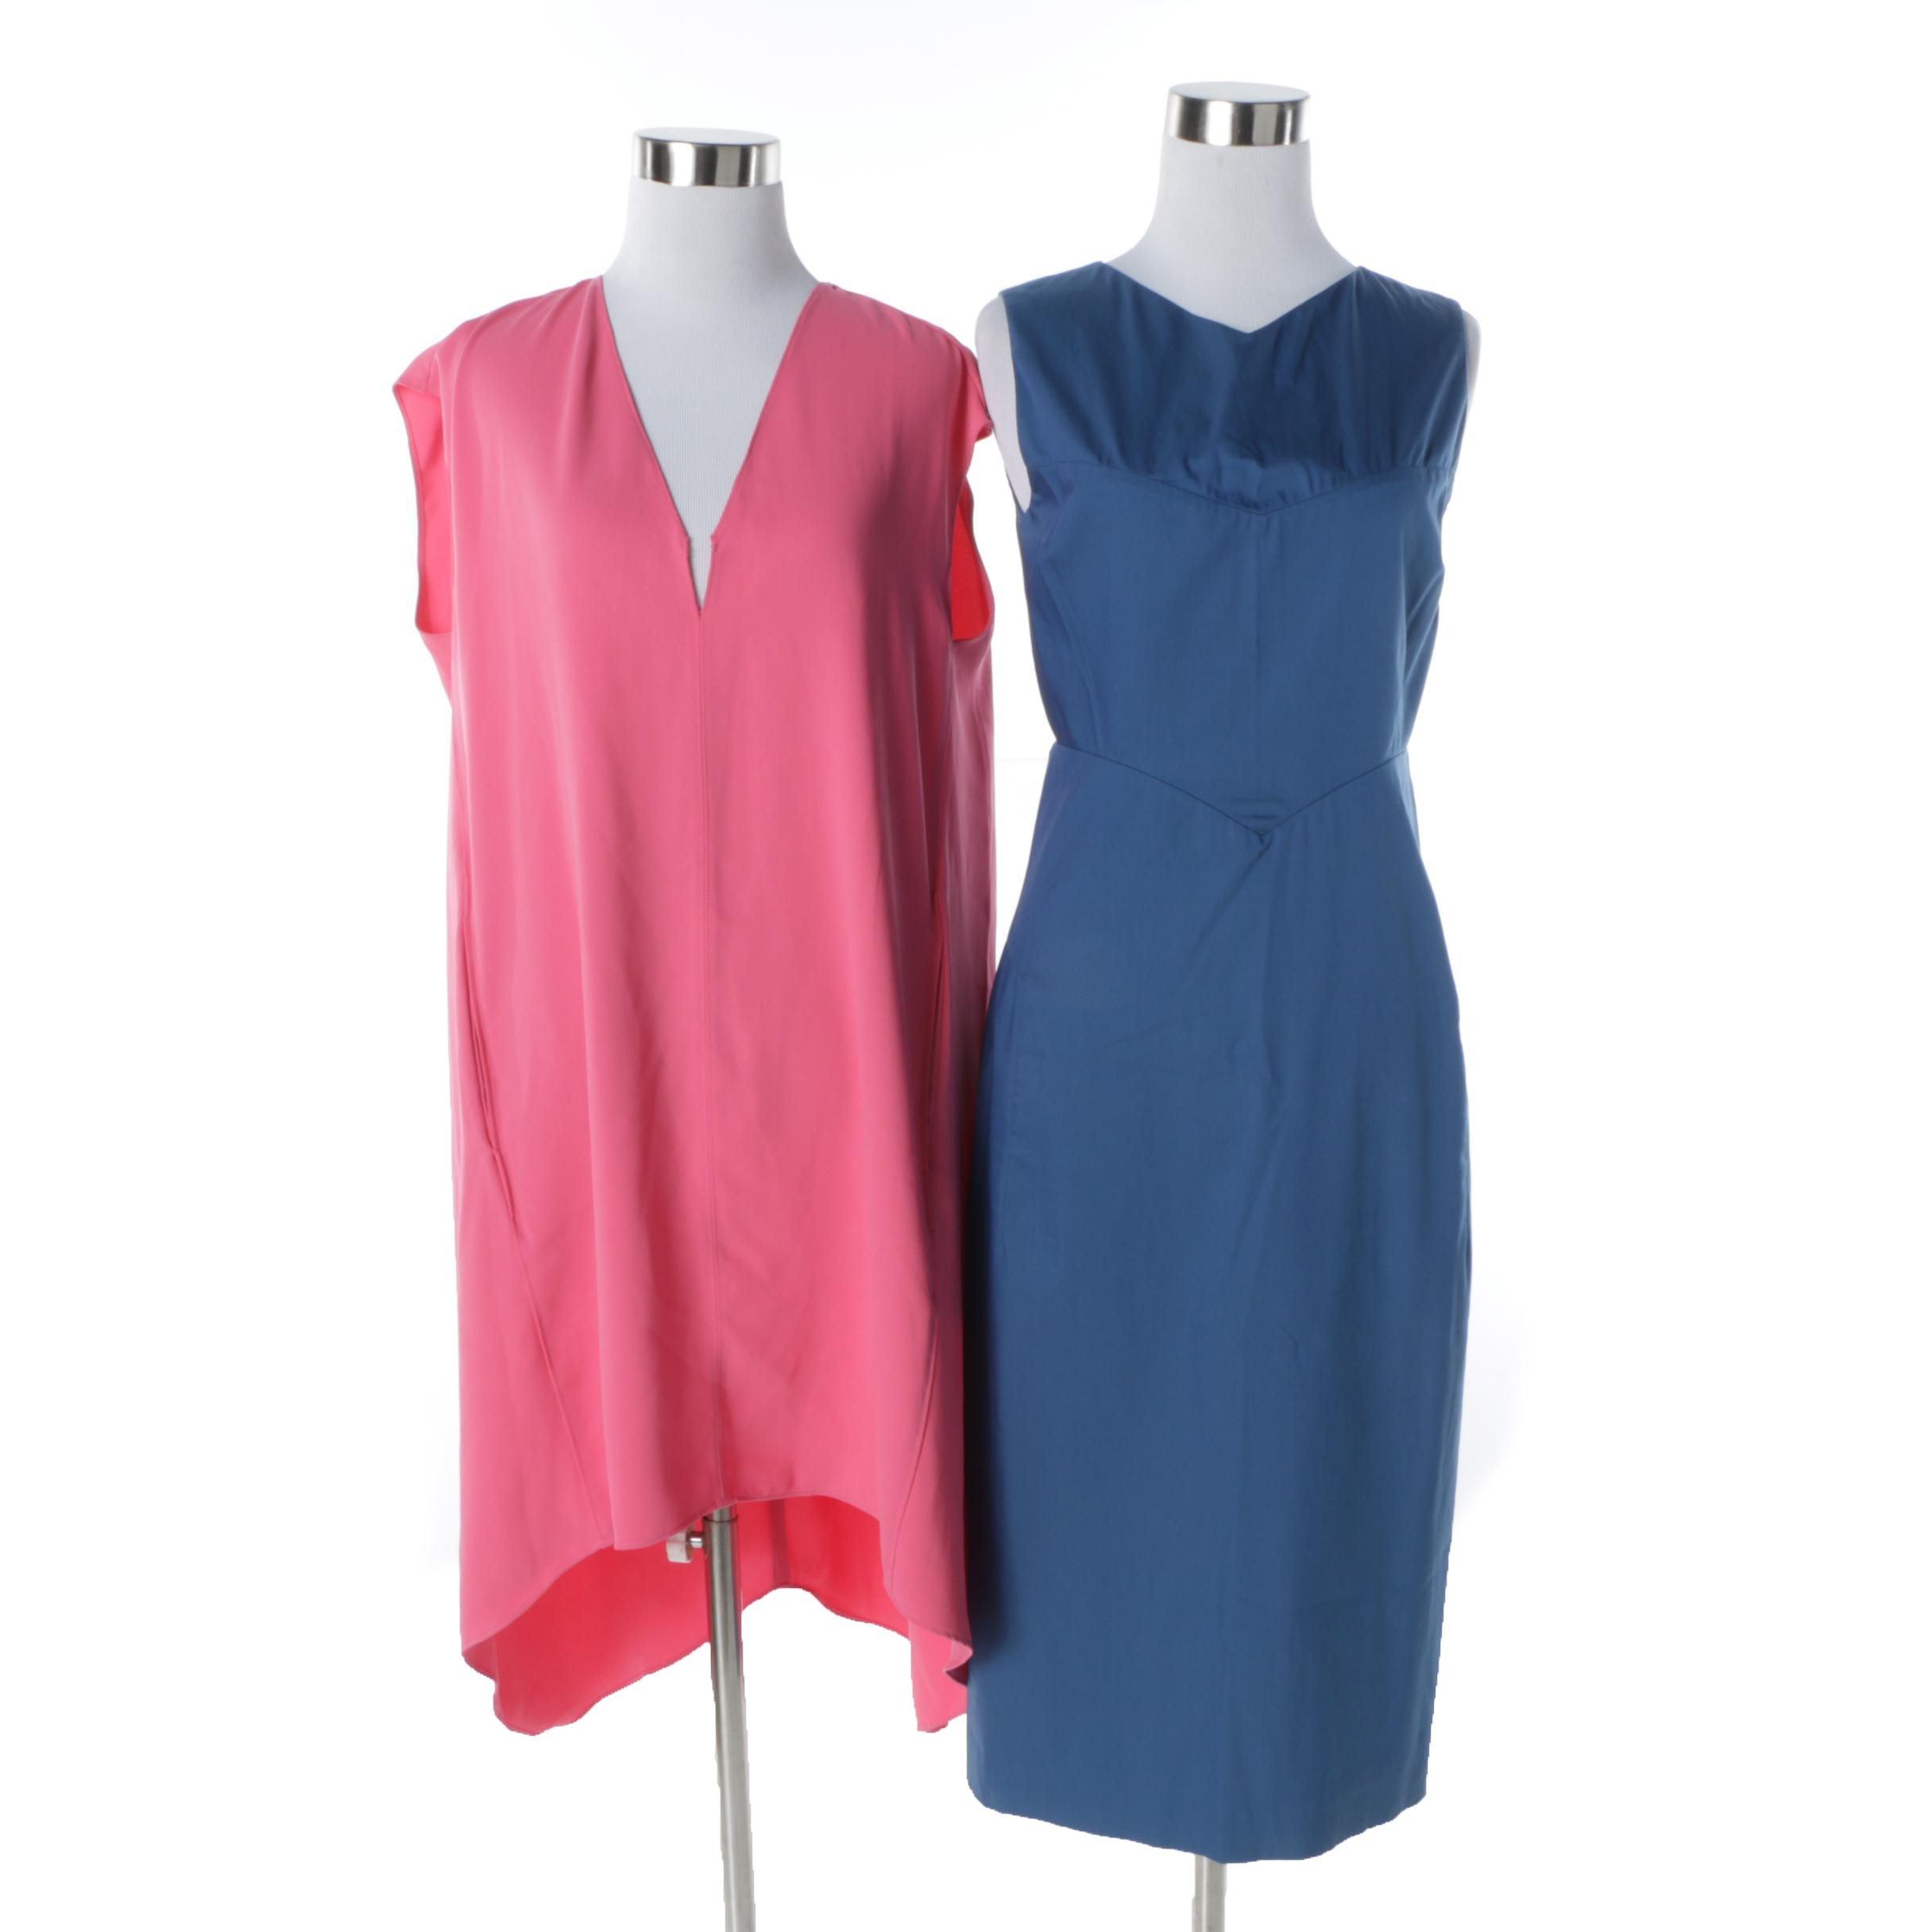 Jil Sander Sleeveless Sheath Dress and Rachael by Rachel Roy Pink Tunic Dress